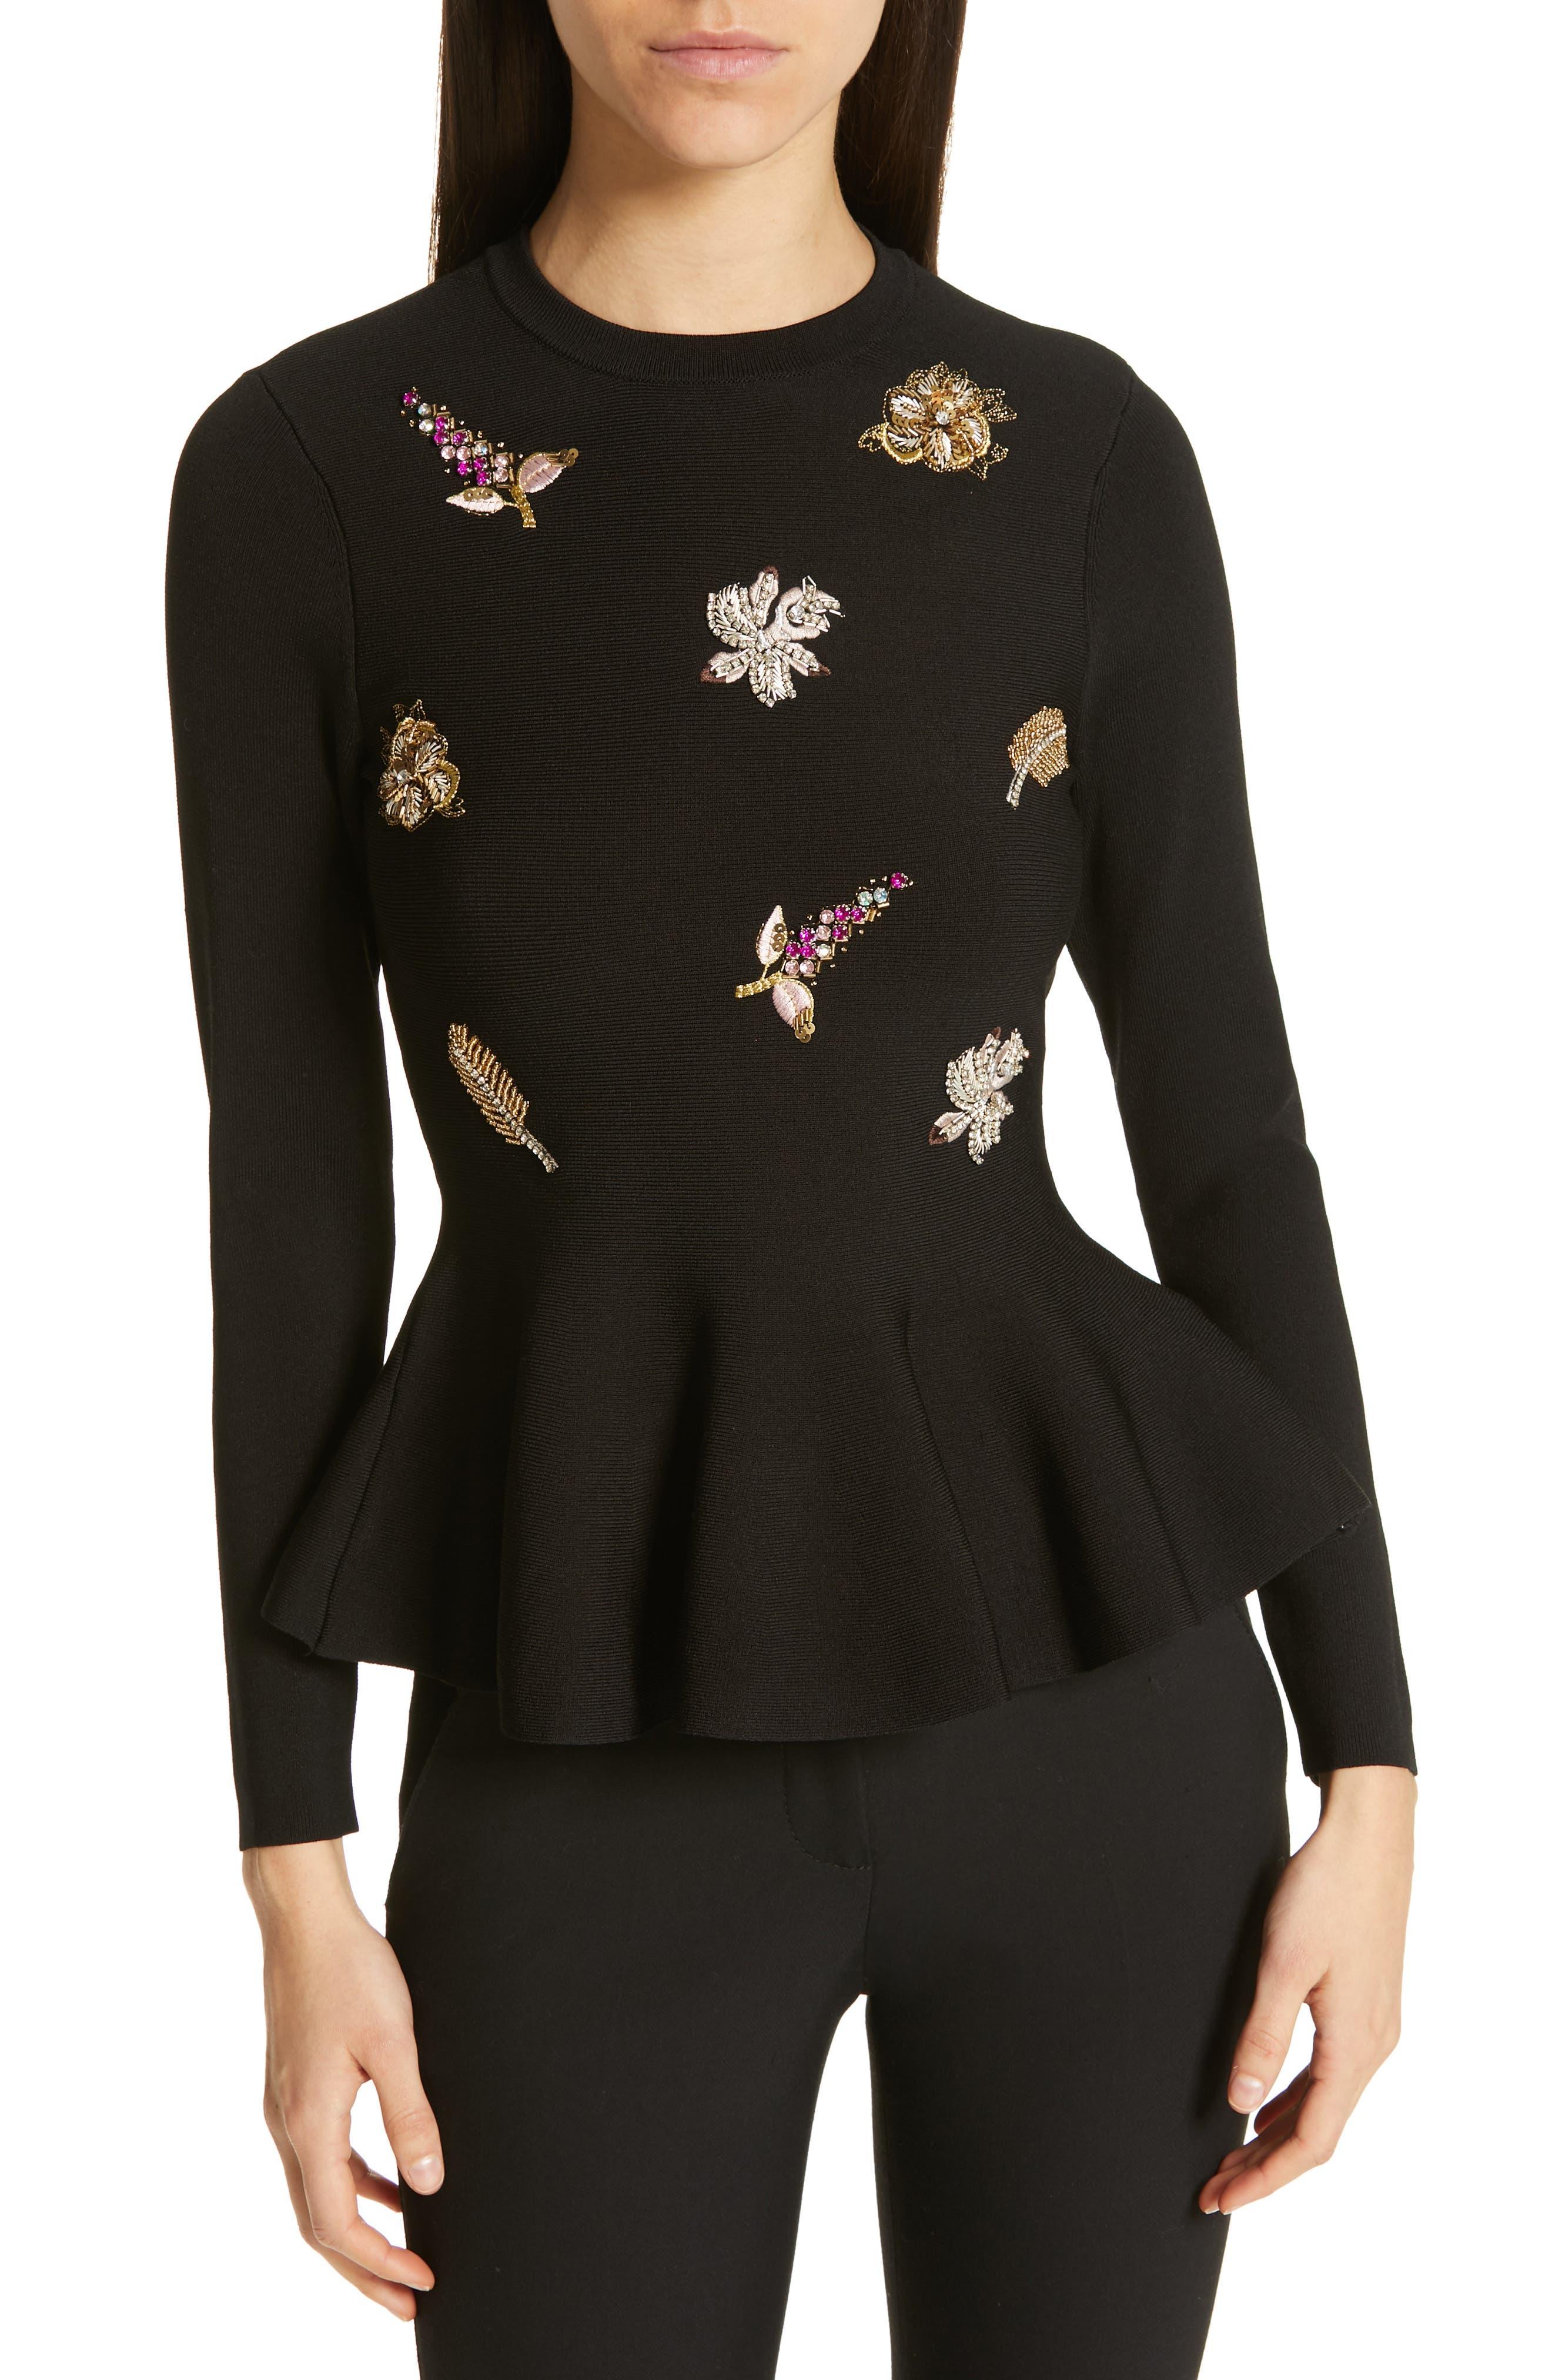 Tynna Embellished Sweater in Black